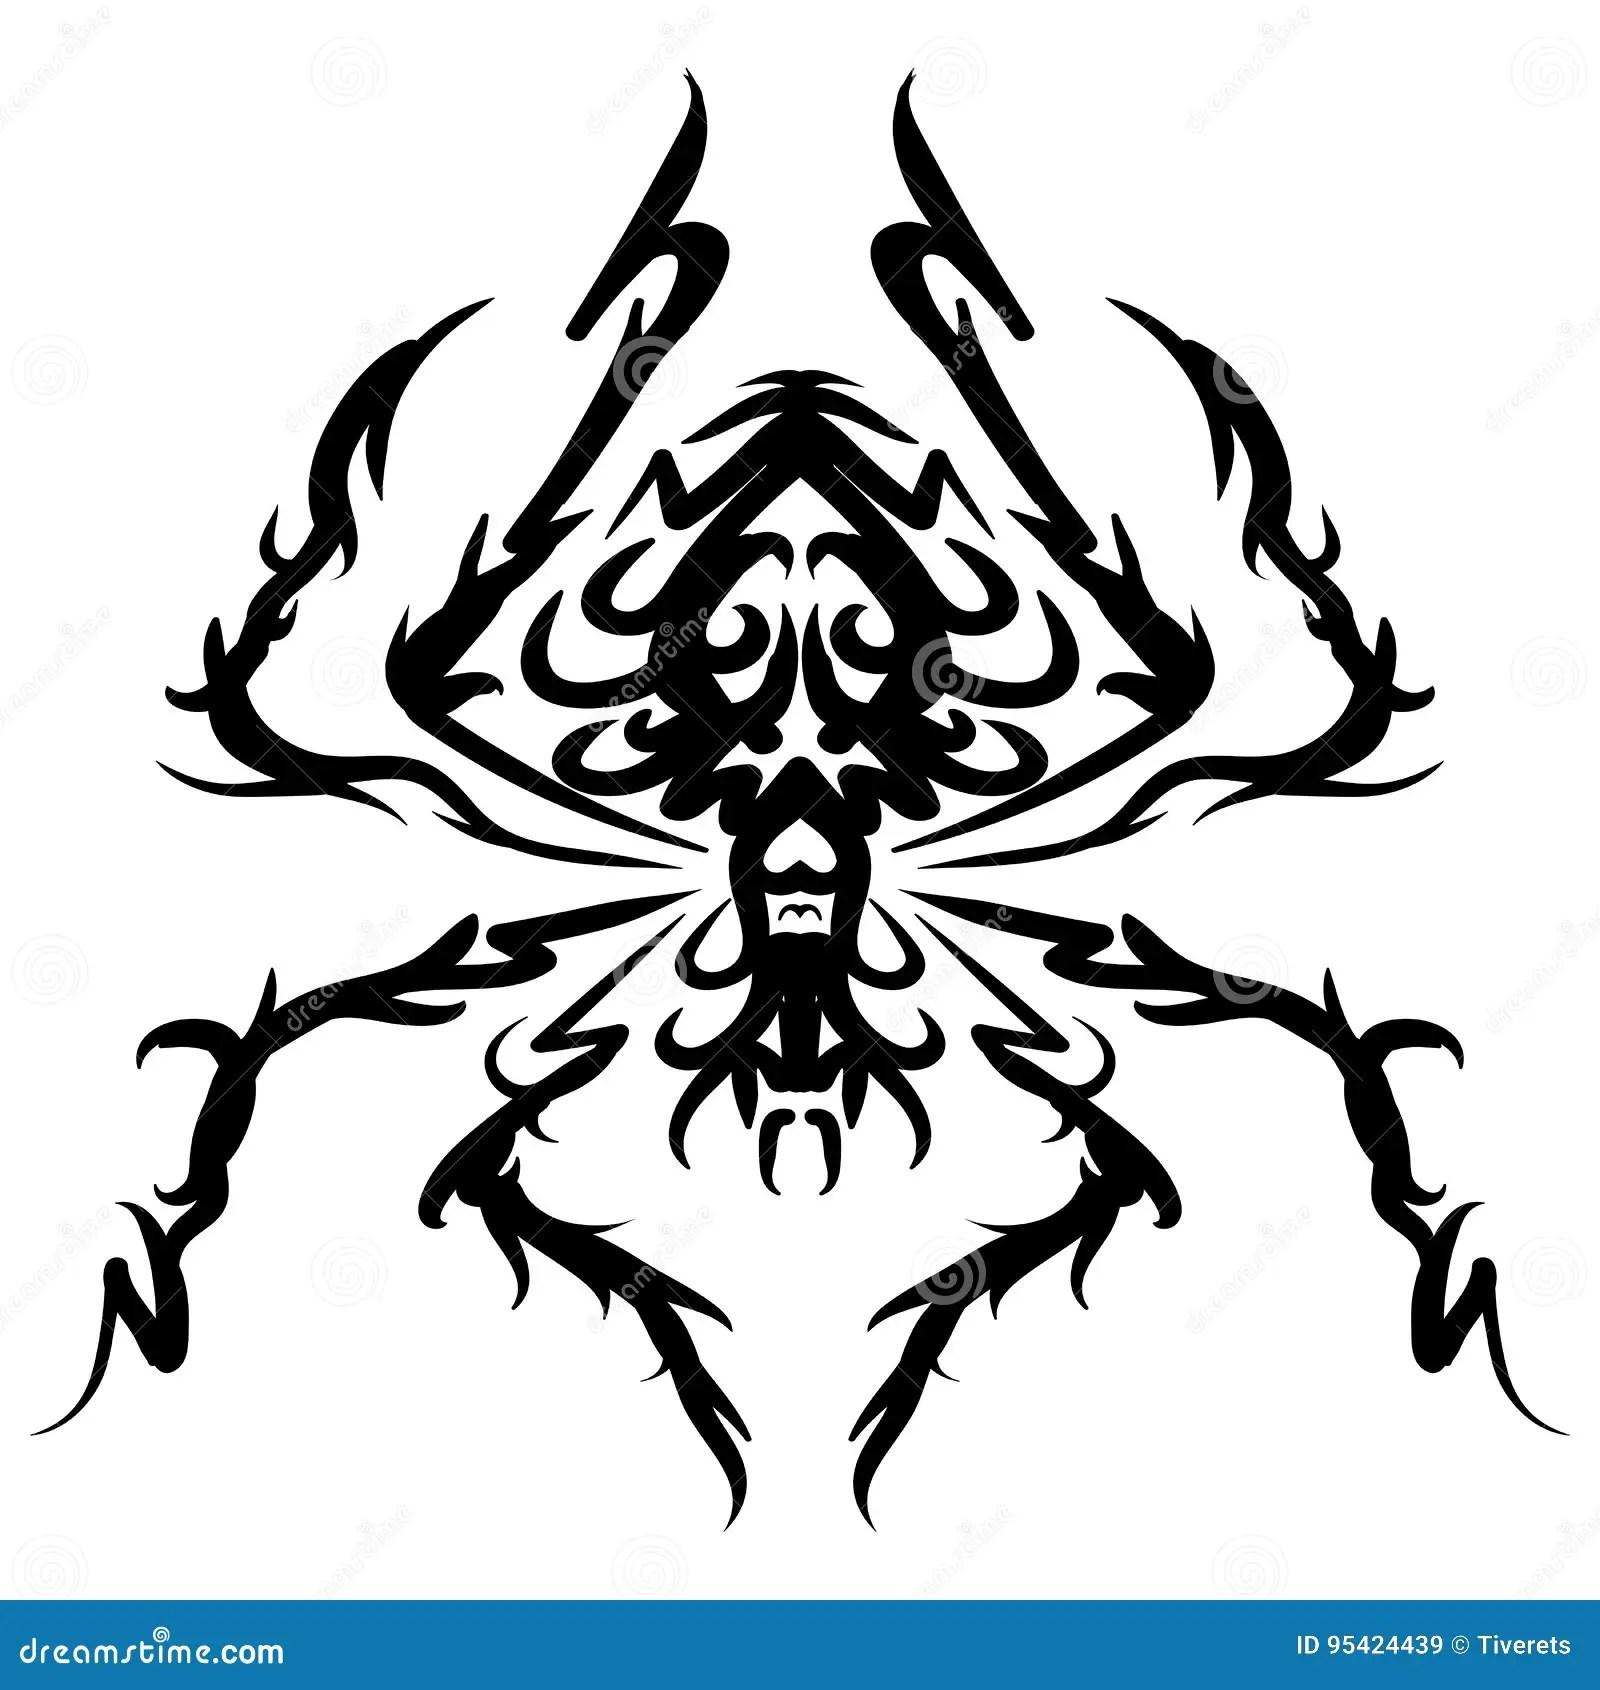 Spider Tribal Tattoo Cartoon Vector